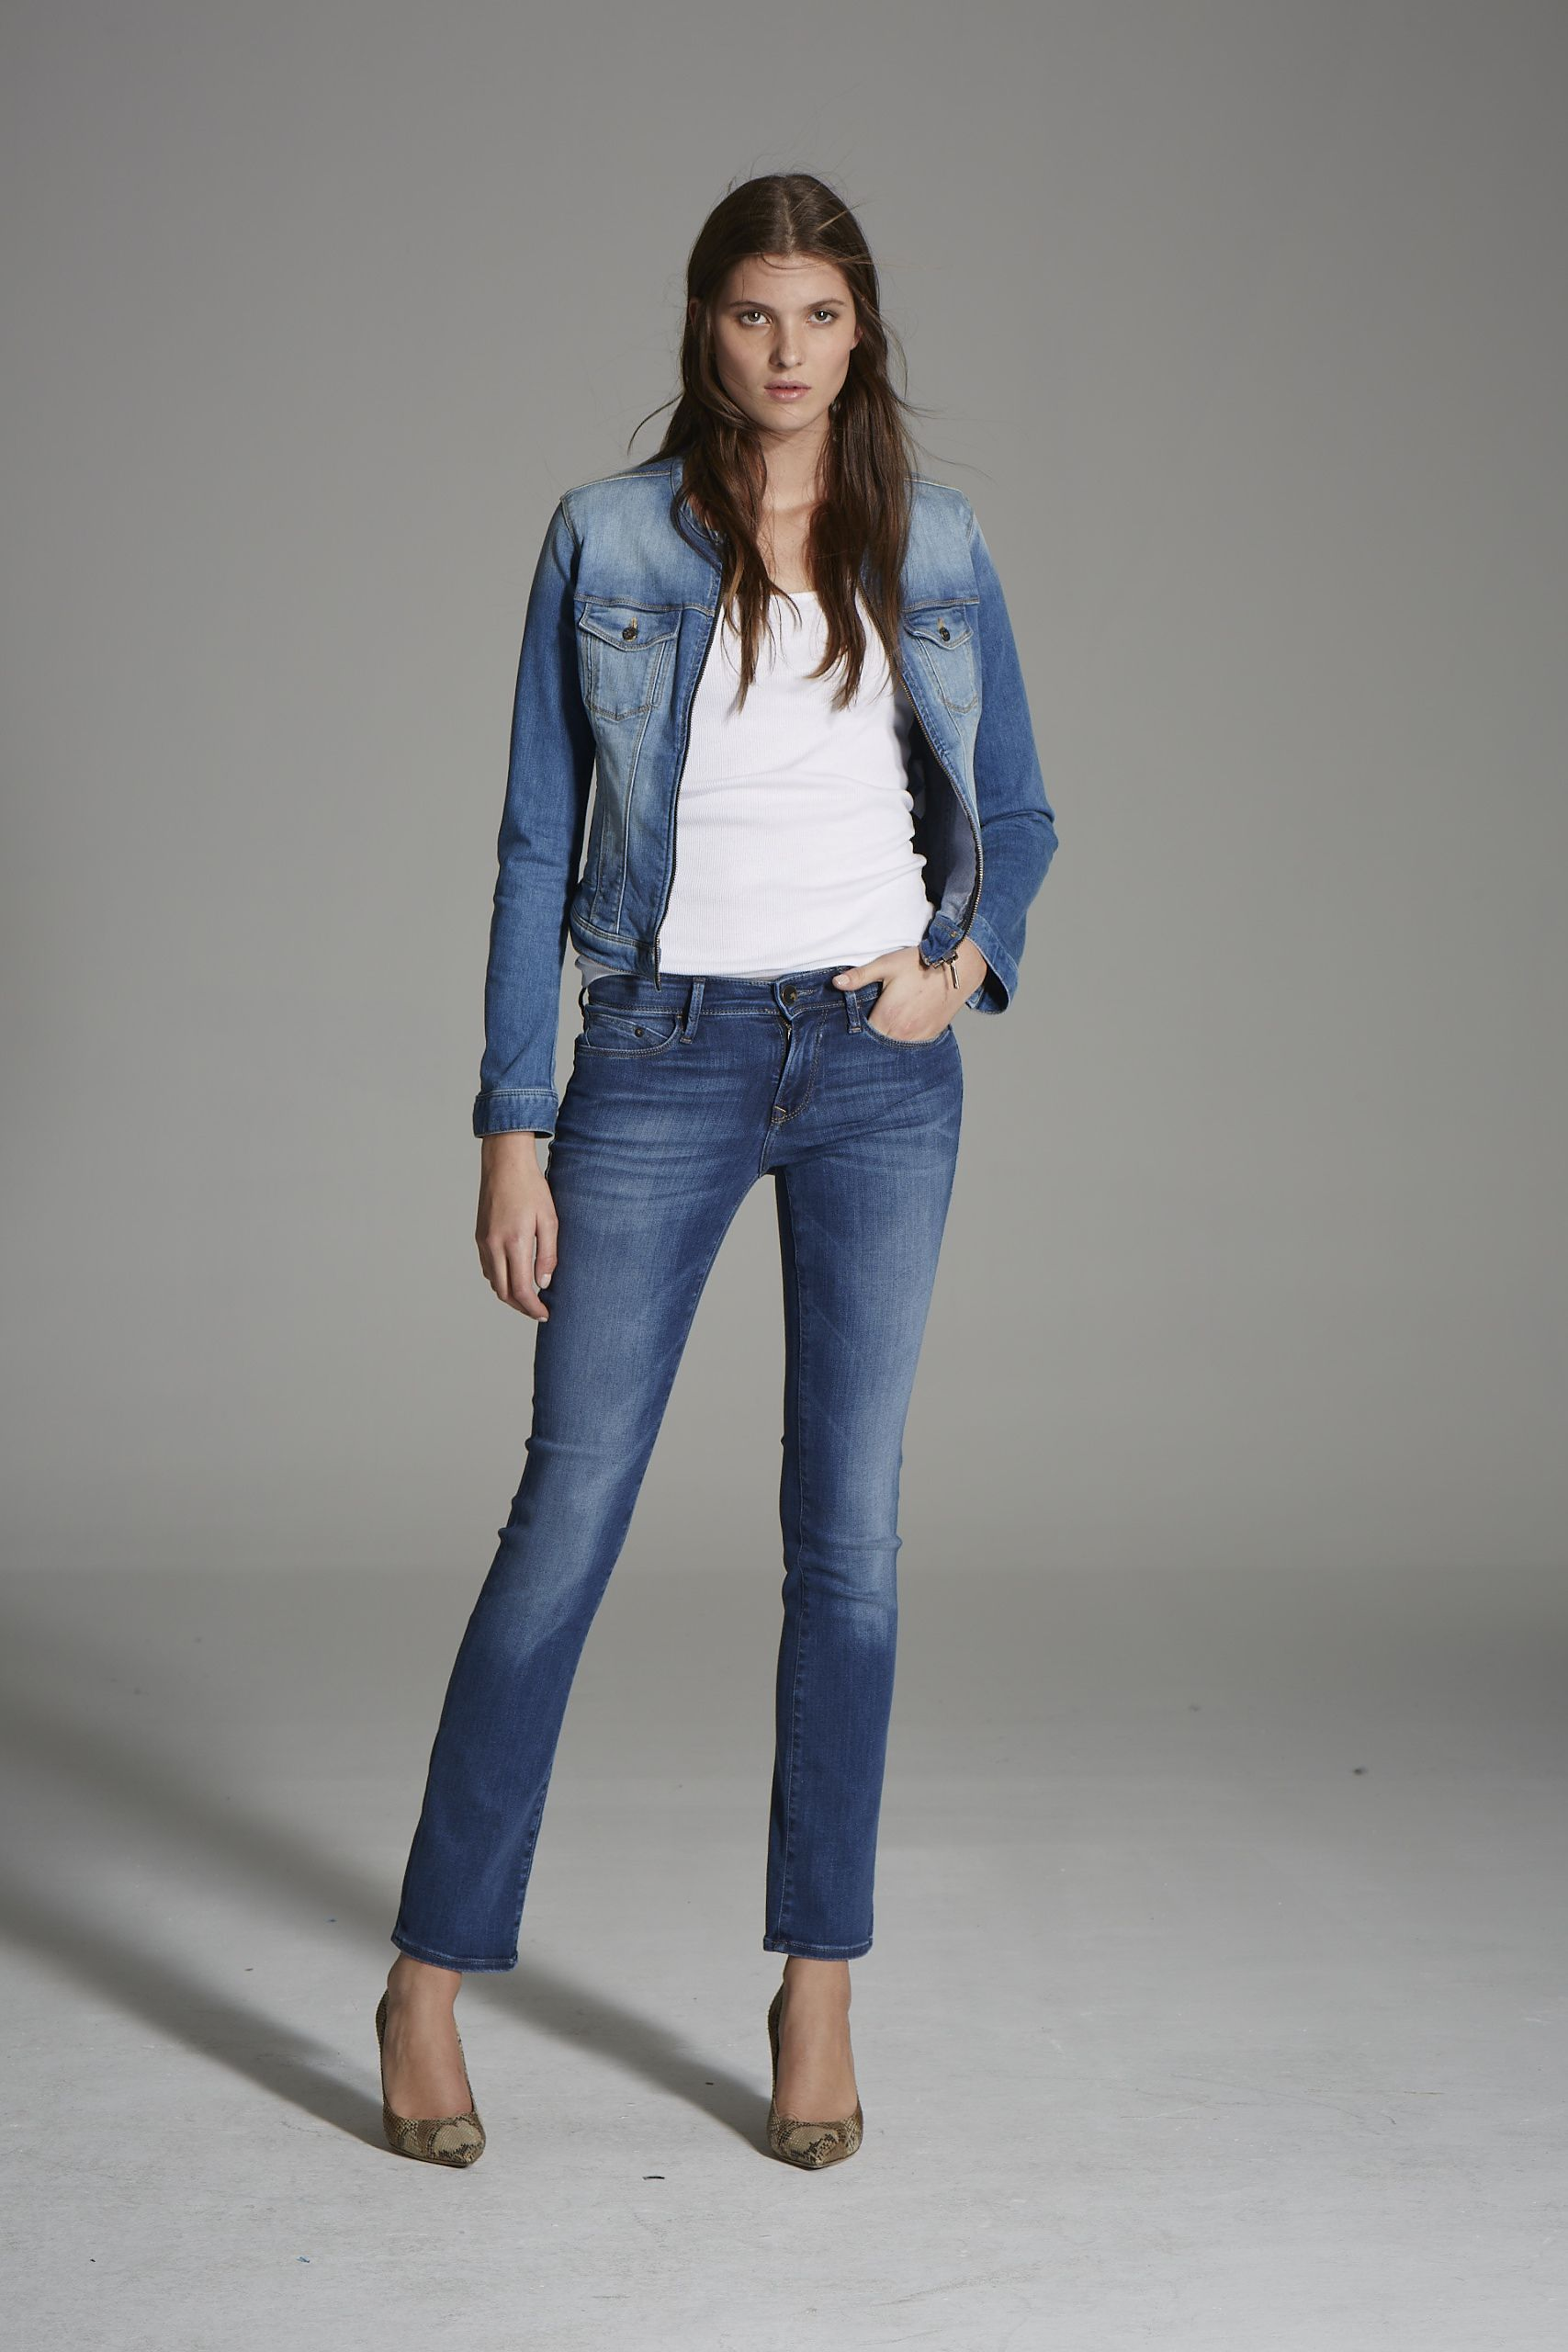 Mavi Claire Denim Jacket + Kerry Straight Leg Jeans   http://us.